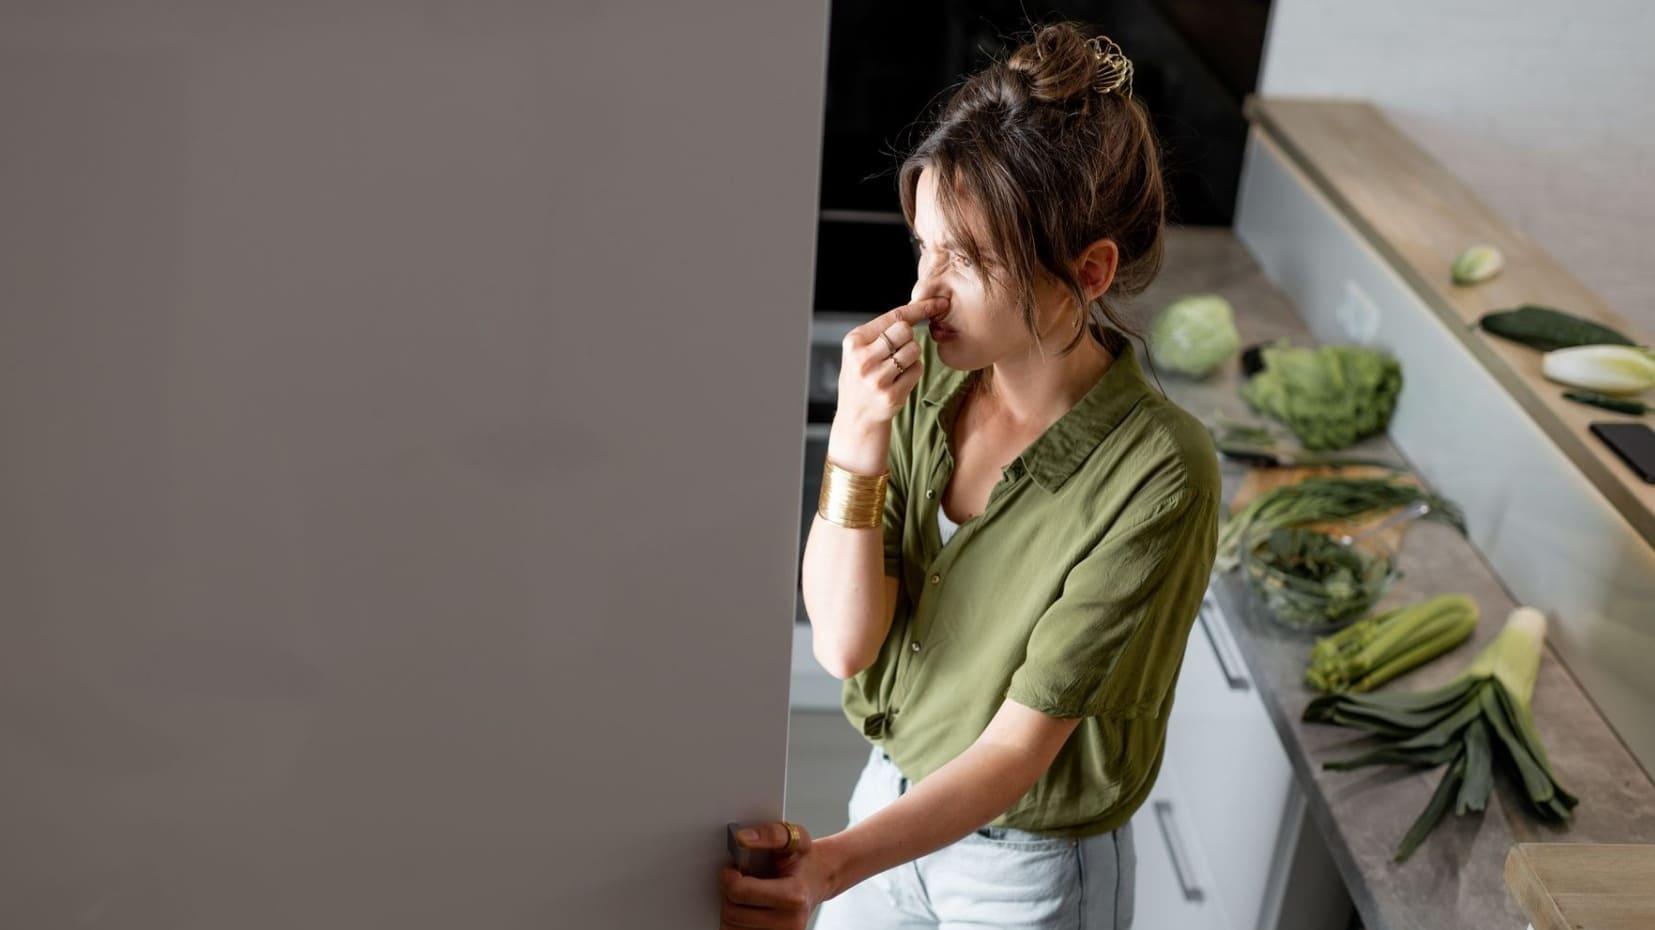 Избавление холодильника от плохих запахов - рекомендации. Услуги клининга в Одессе